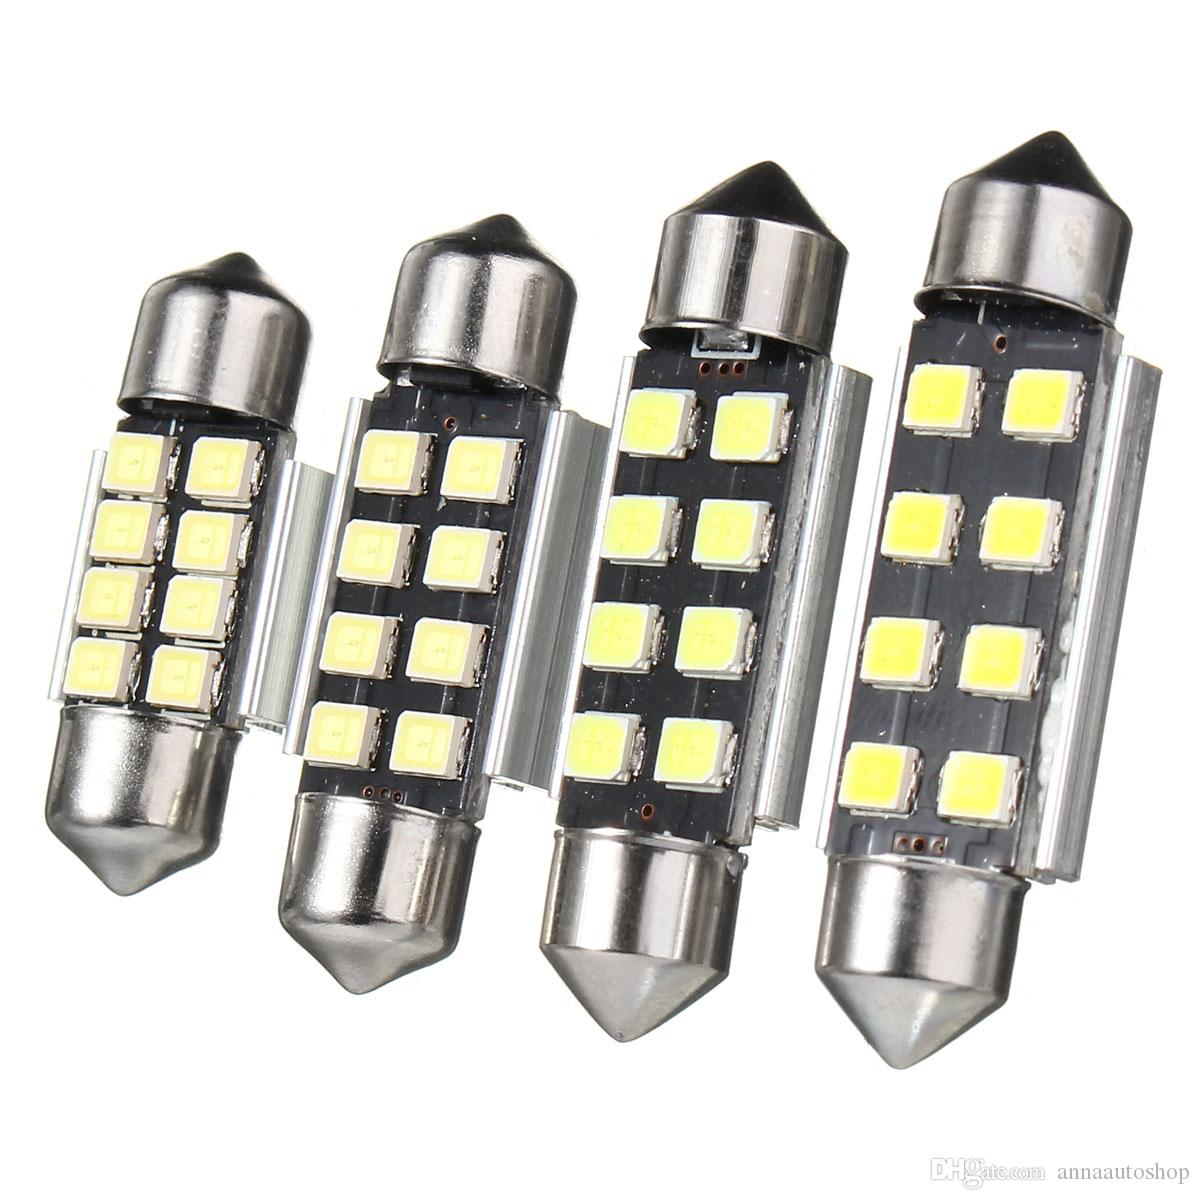 Araba styling LED İç Harita Işık Festoon 36mm 31mm 39mm 41mm 2835 Hata Ücretsiz 8SMD LED Okuma Işık Araba İç Dome lamba Ampüller